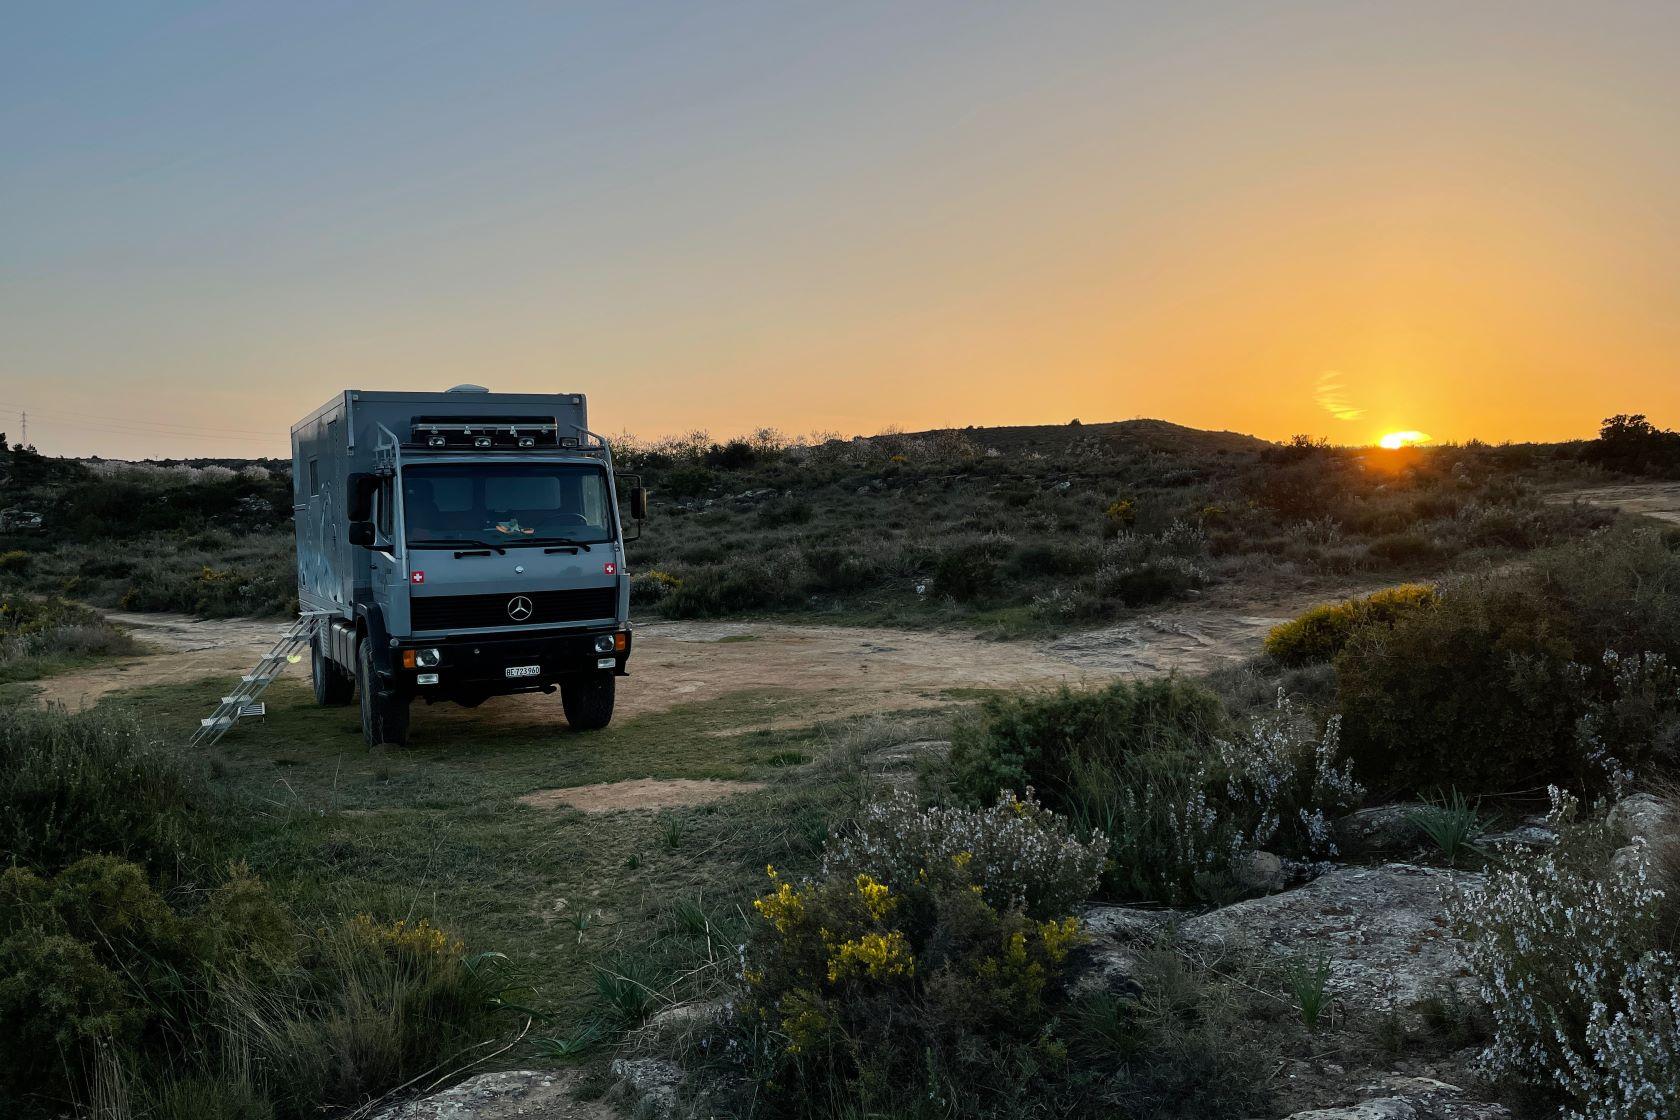 Sunset Rio Ebro Camping Wildcamping